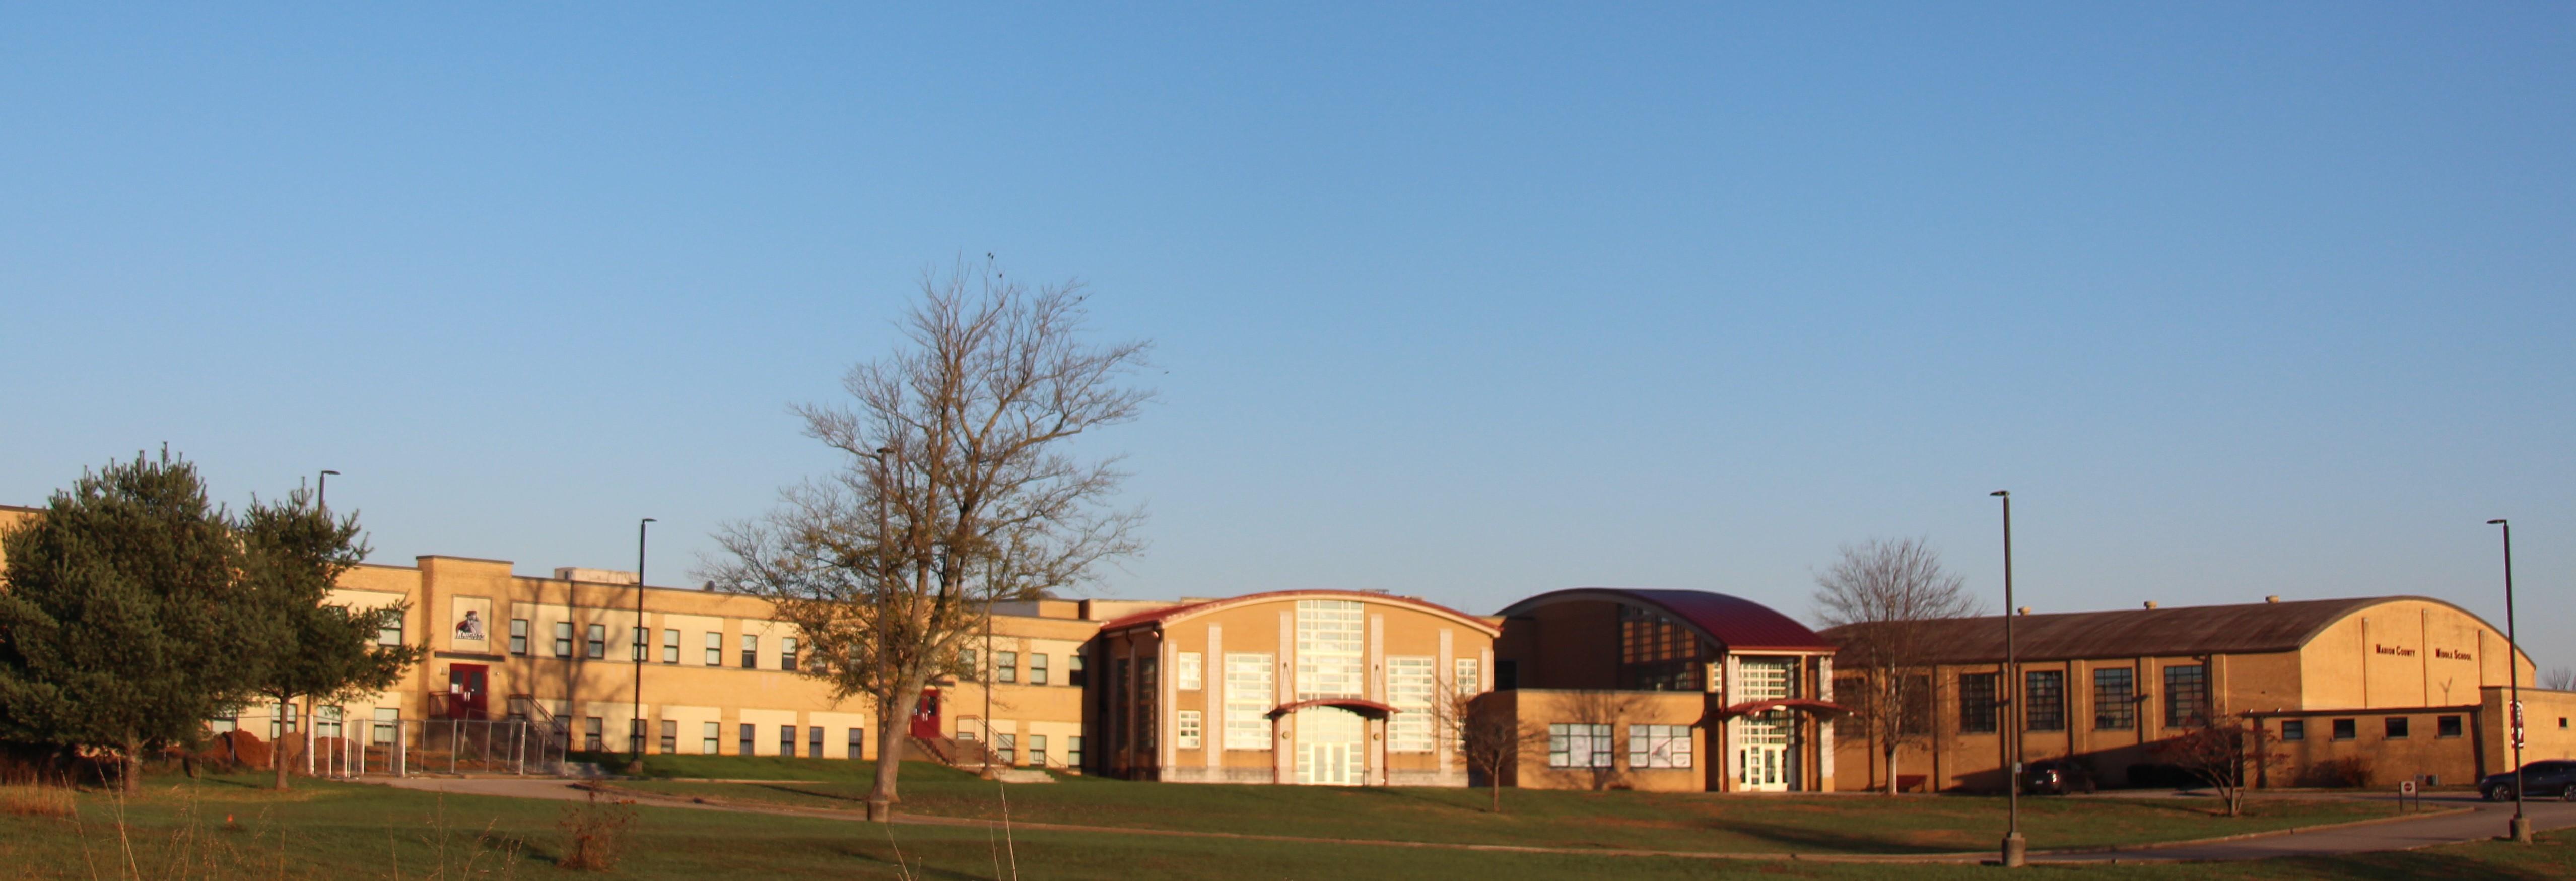 mcms school